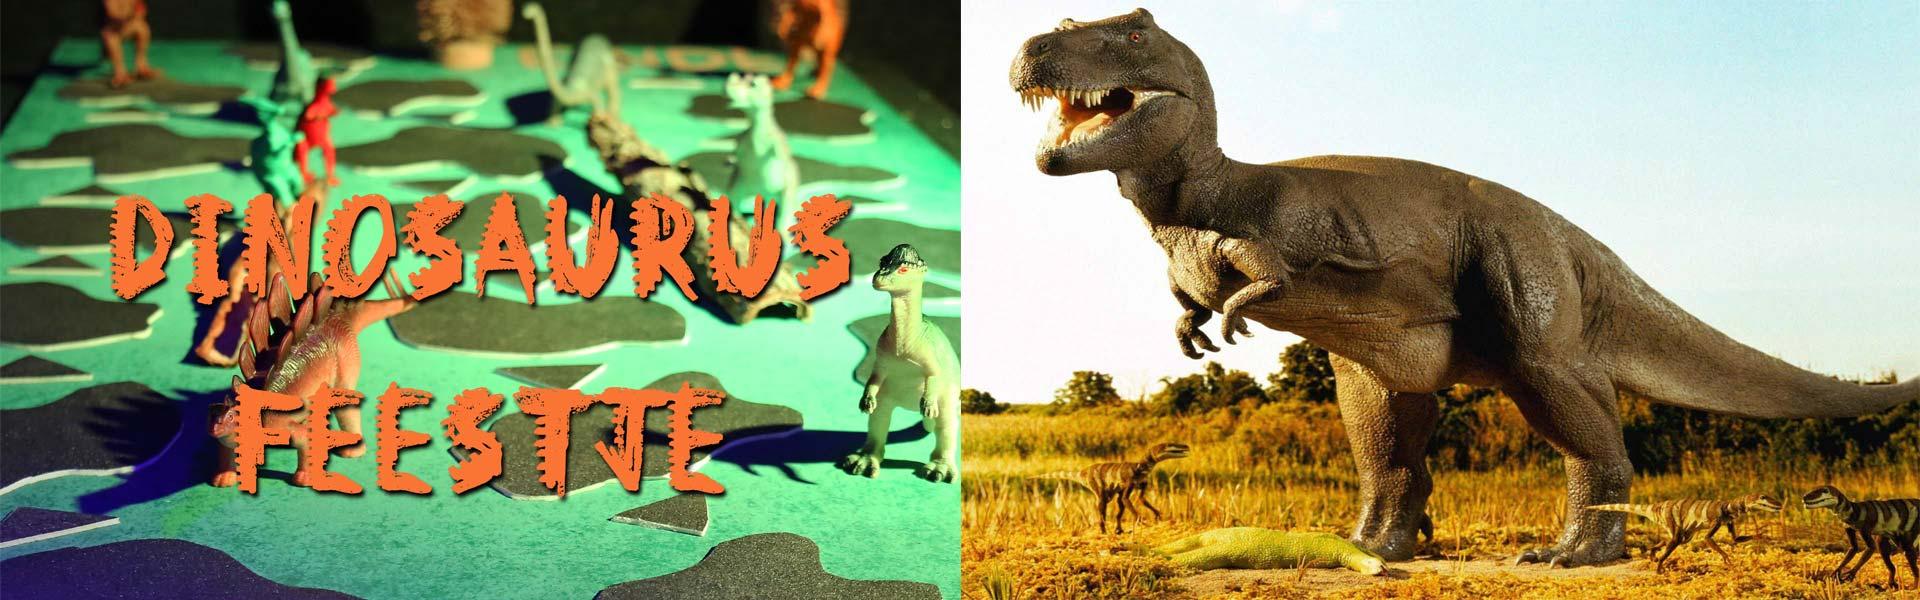 dino jongens feestje dinosaurus